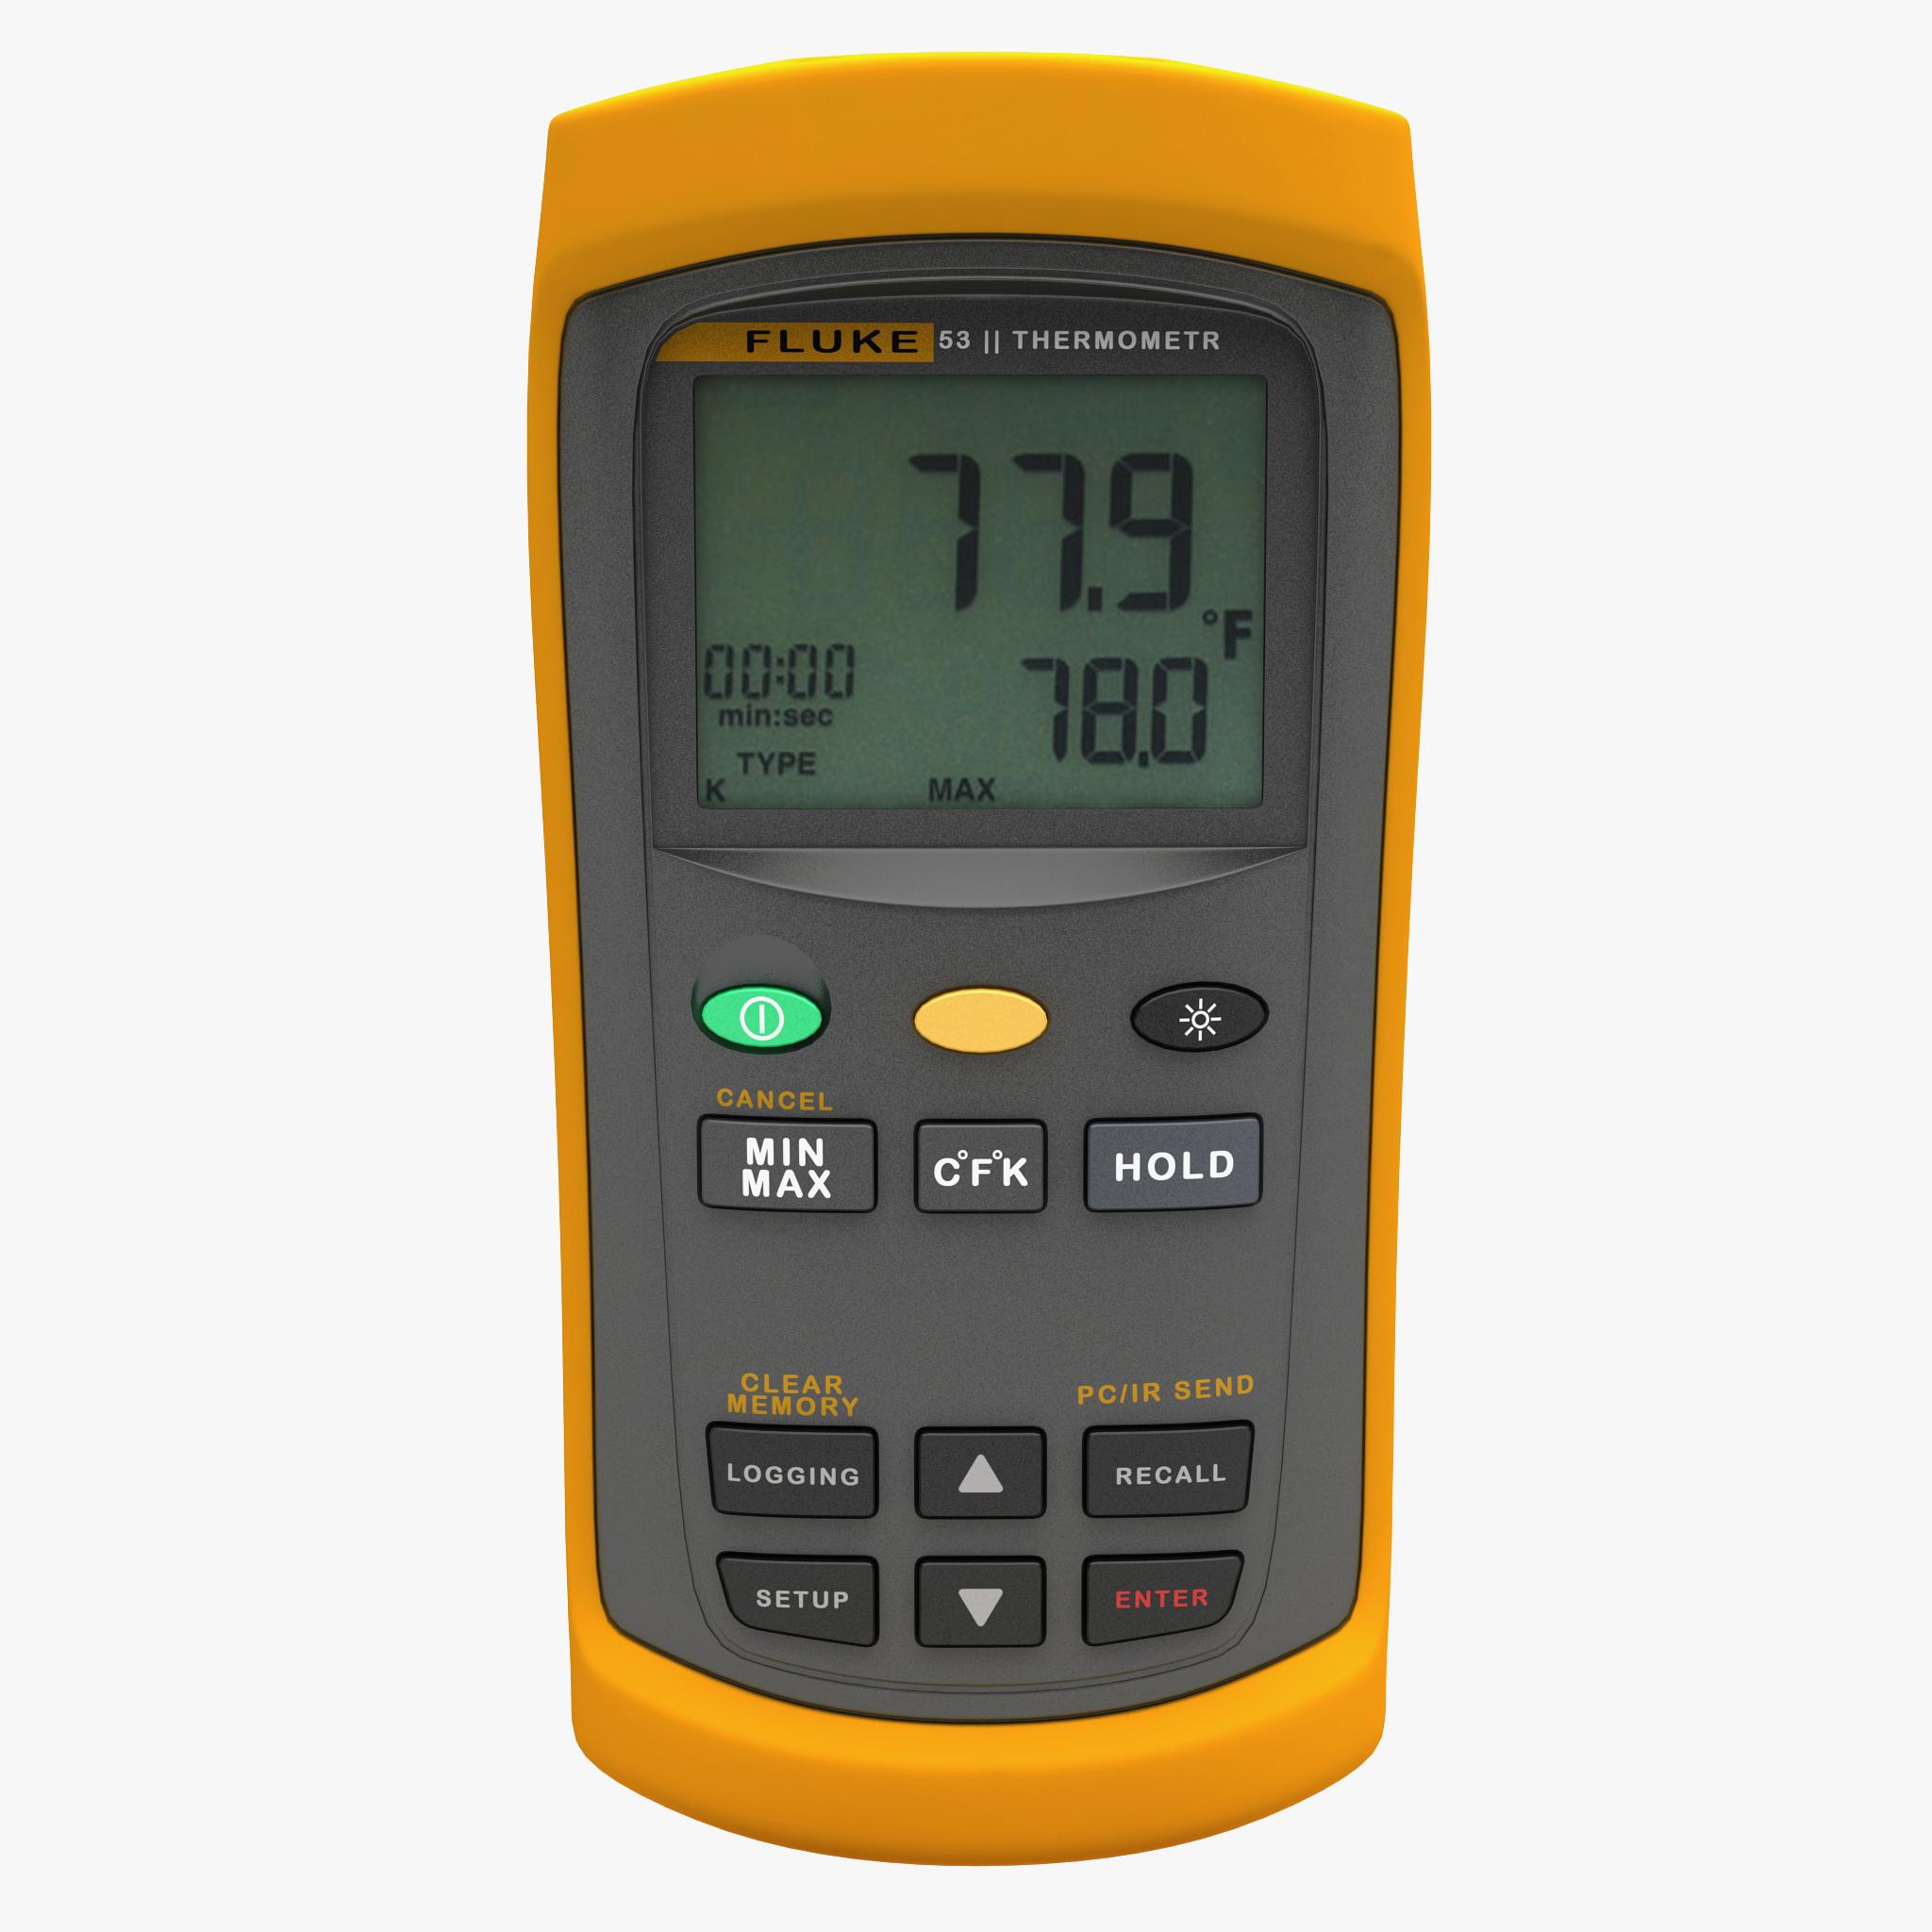 Digital Thermocouple Meter Fluke_145.jpg